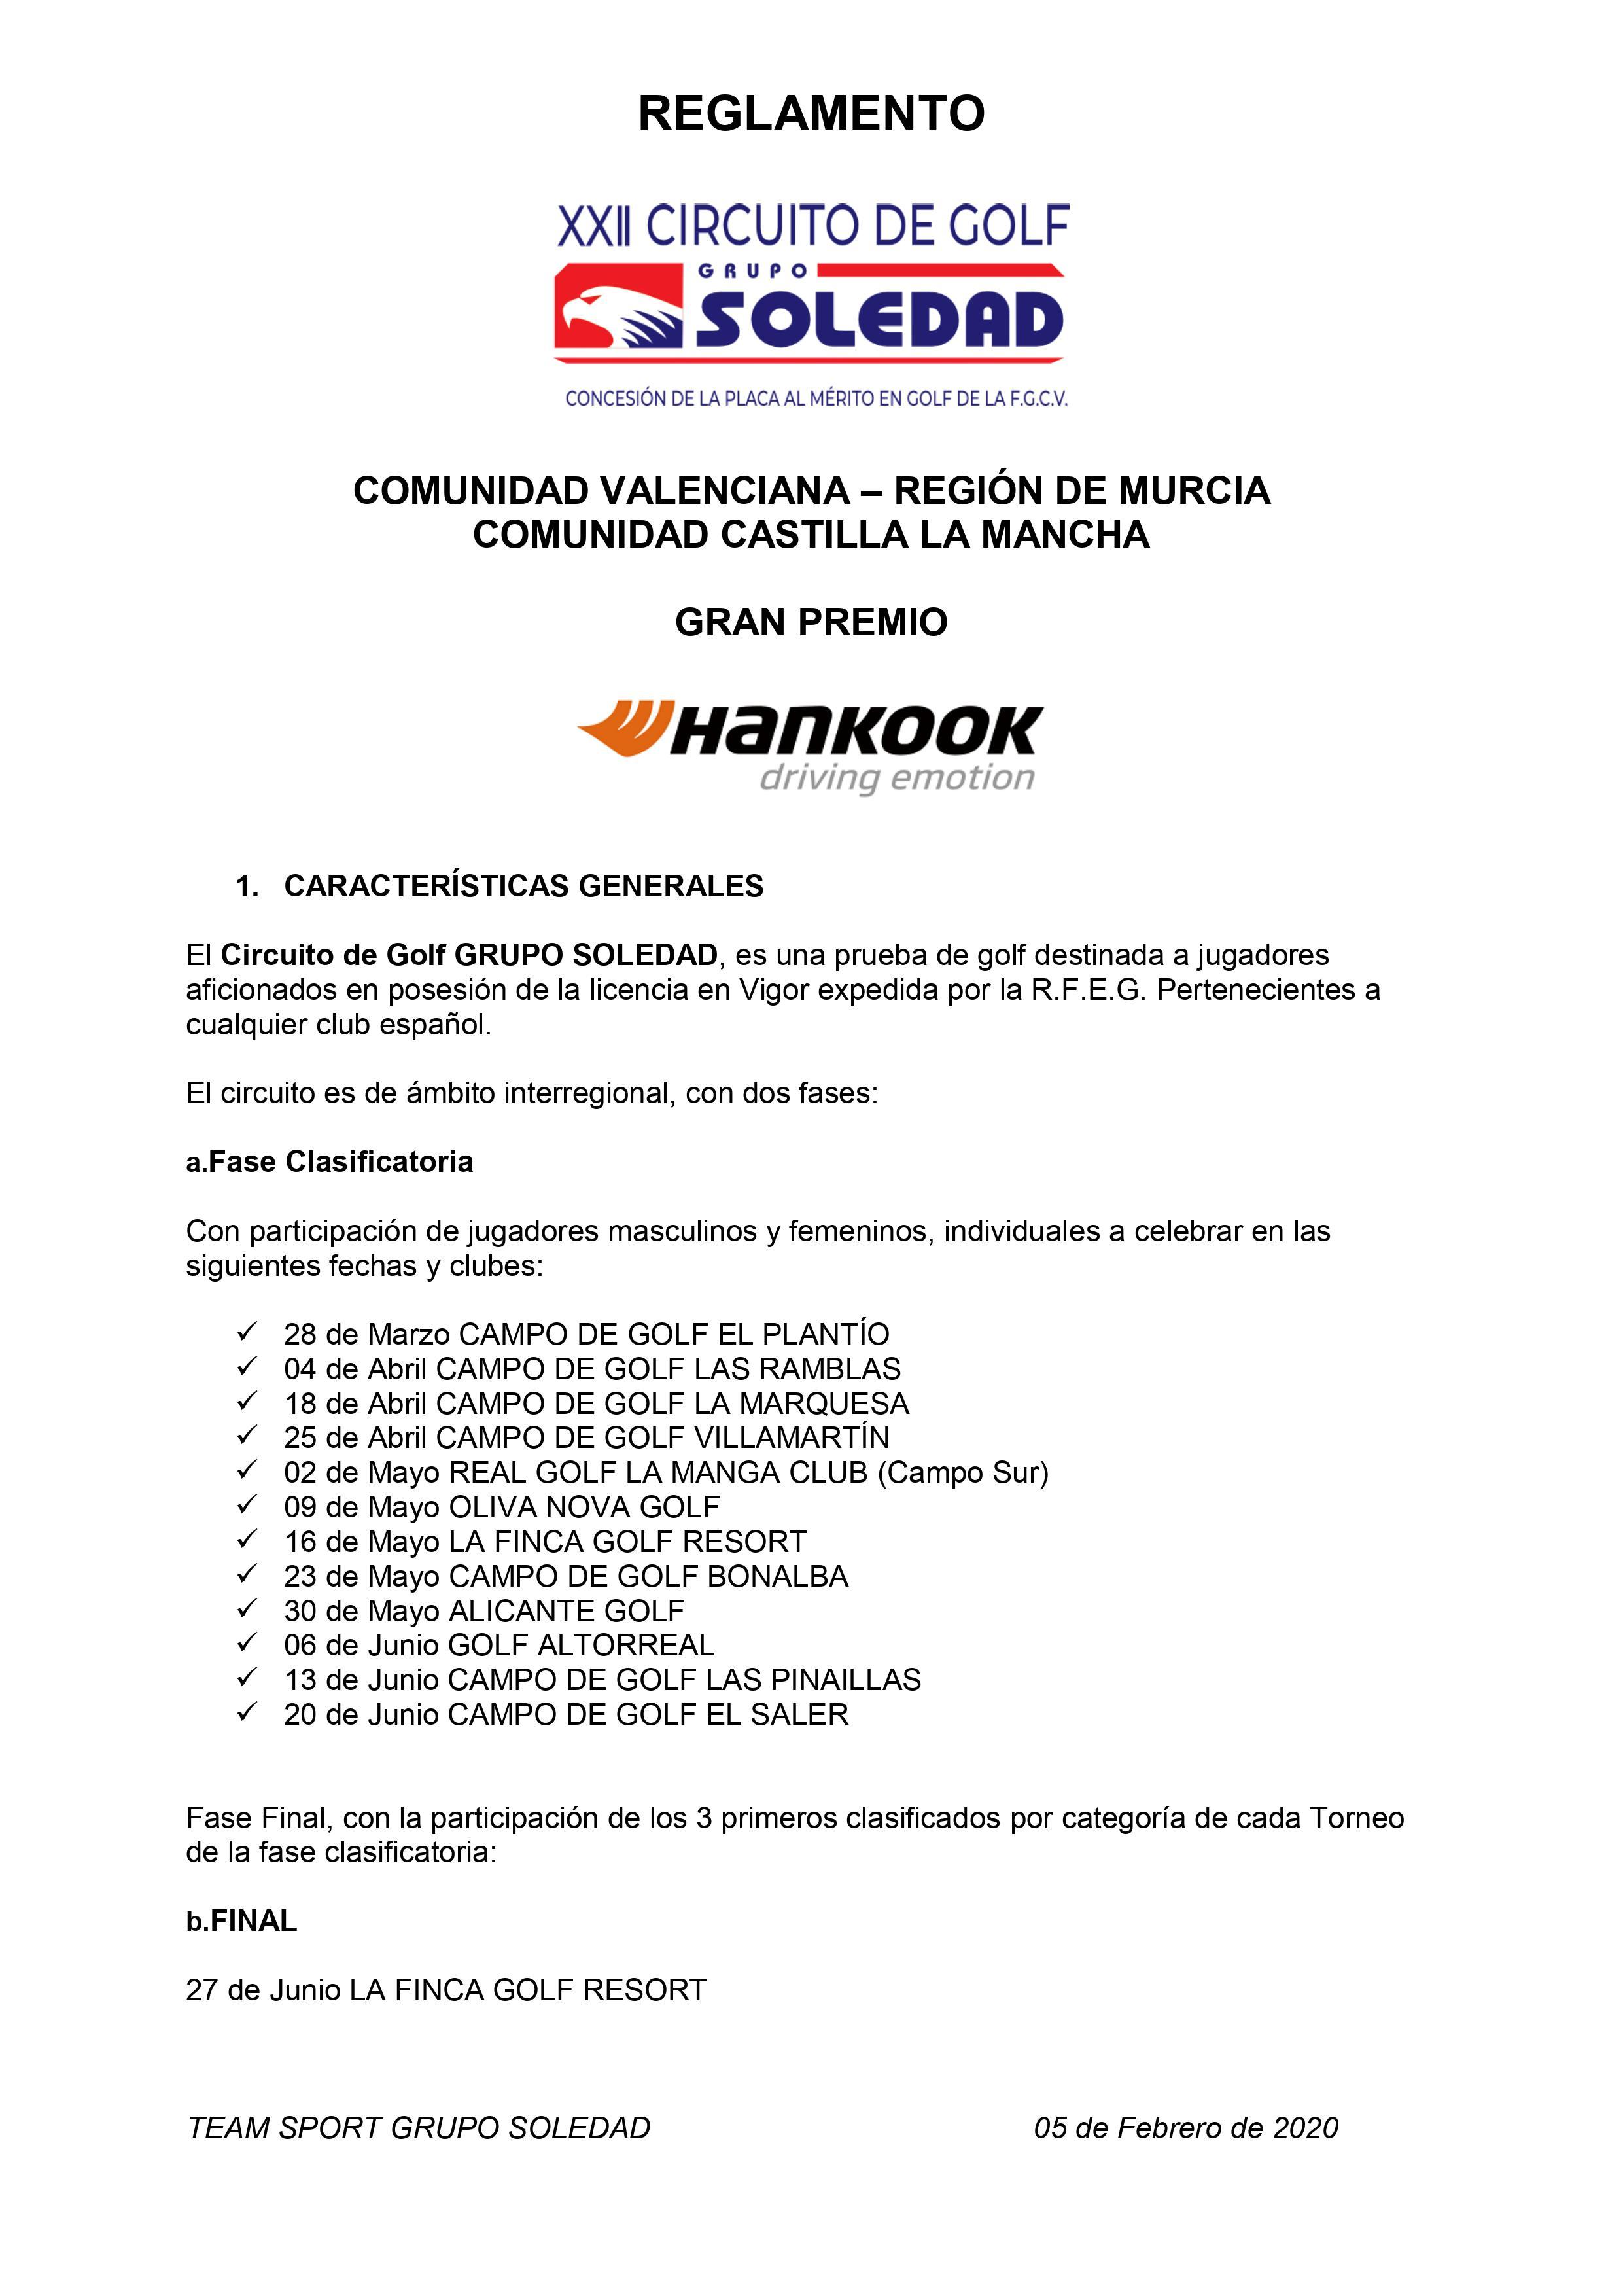 200328 PLA, Reglamento del circuito (1)